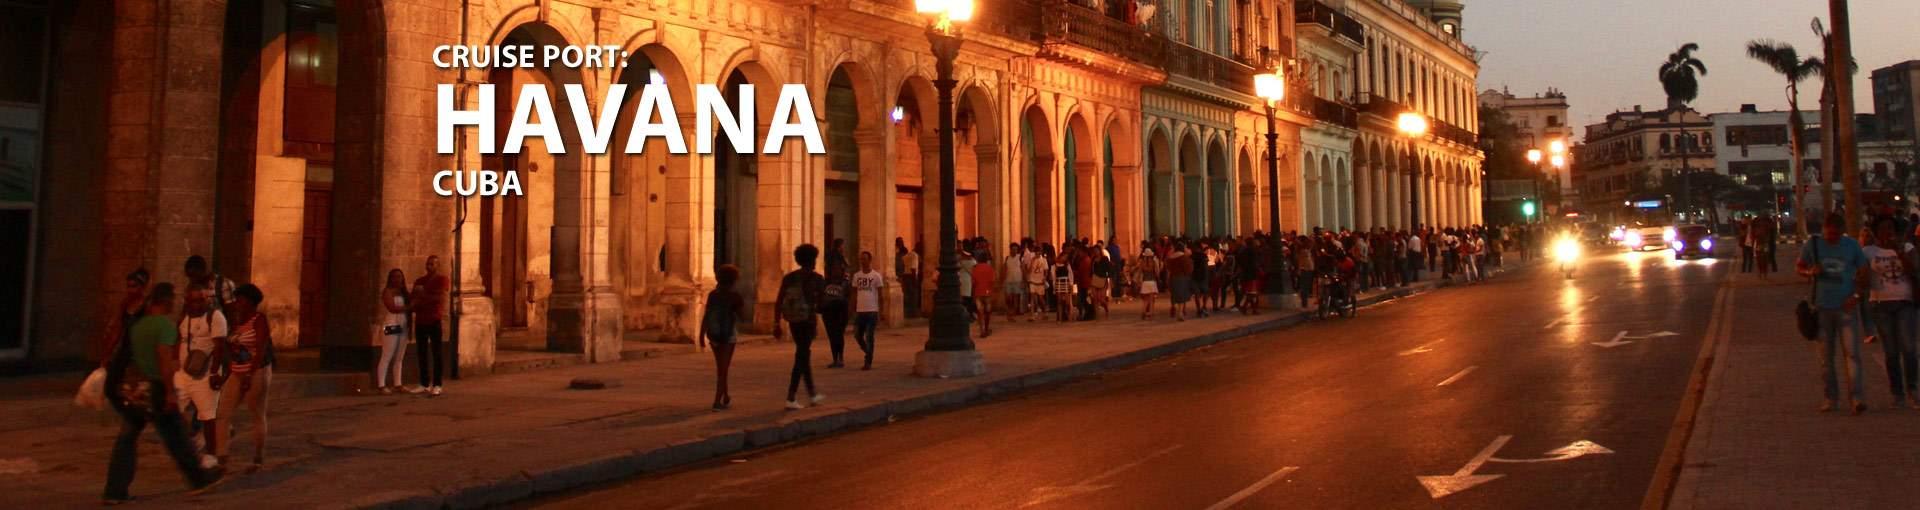 Havana, Cuba Cruise Port